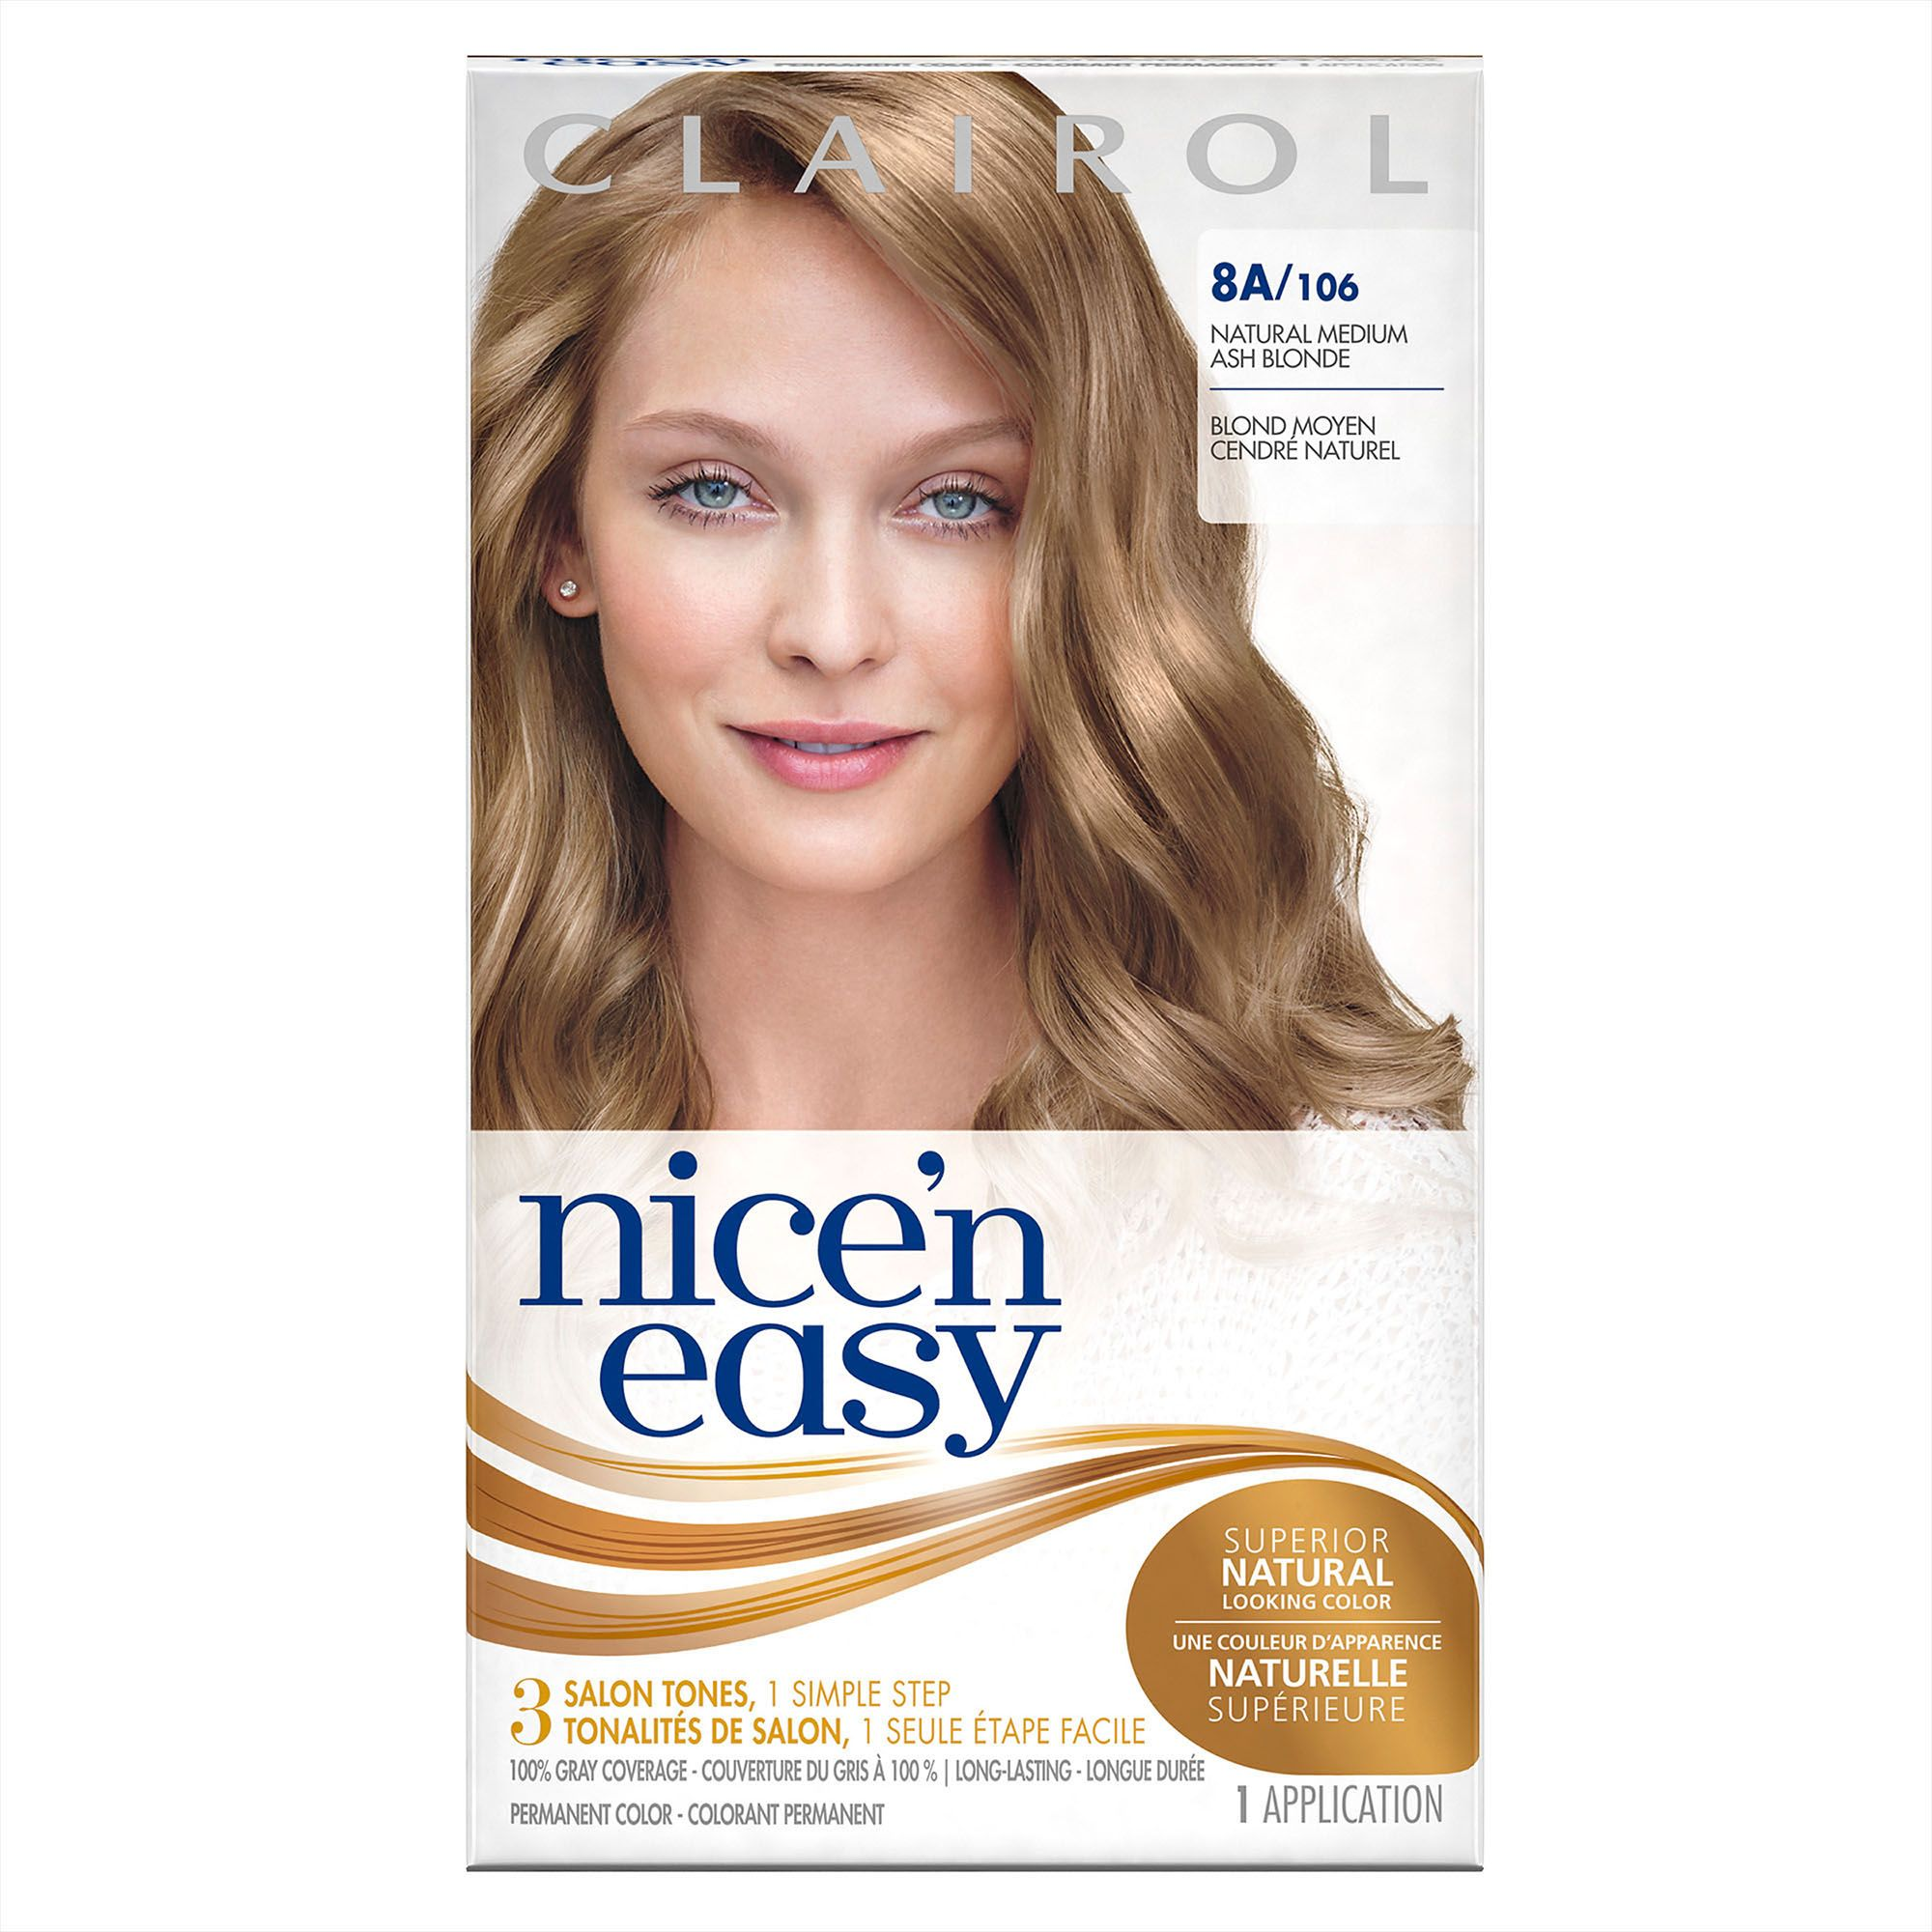 Beauty In 2020 Medium Ash Blonde Clairol Hair Color Medium Blonde